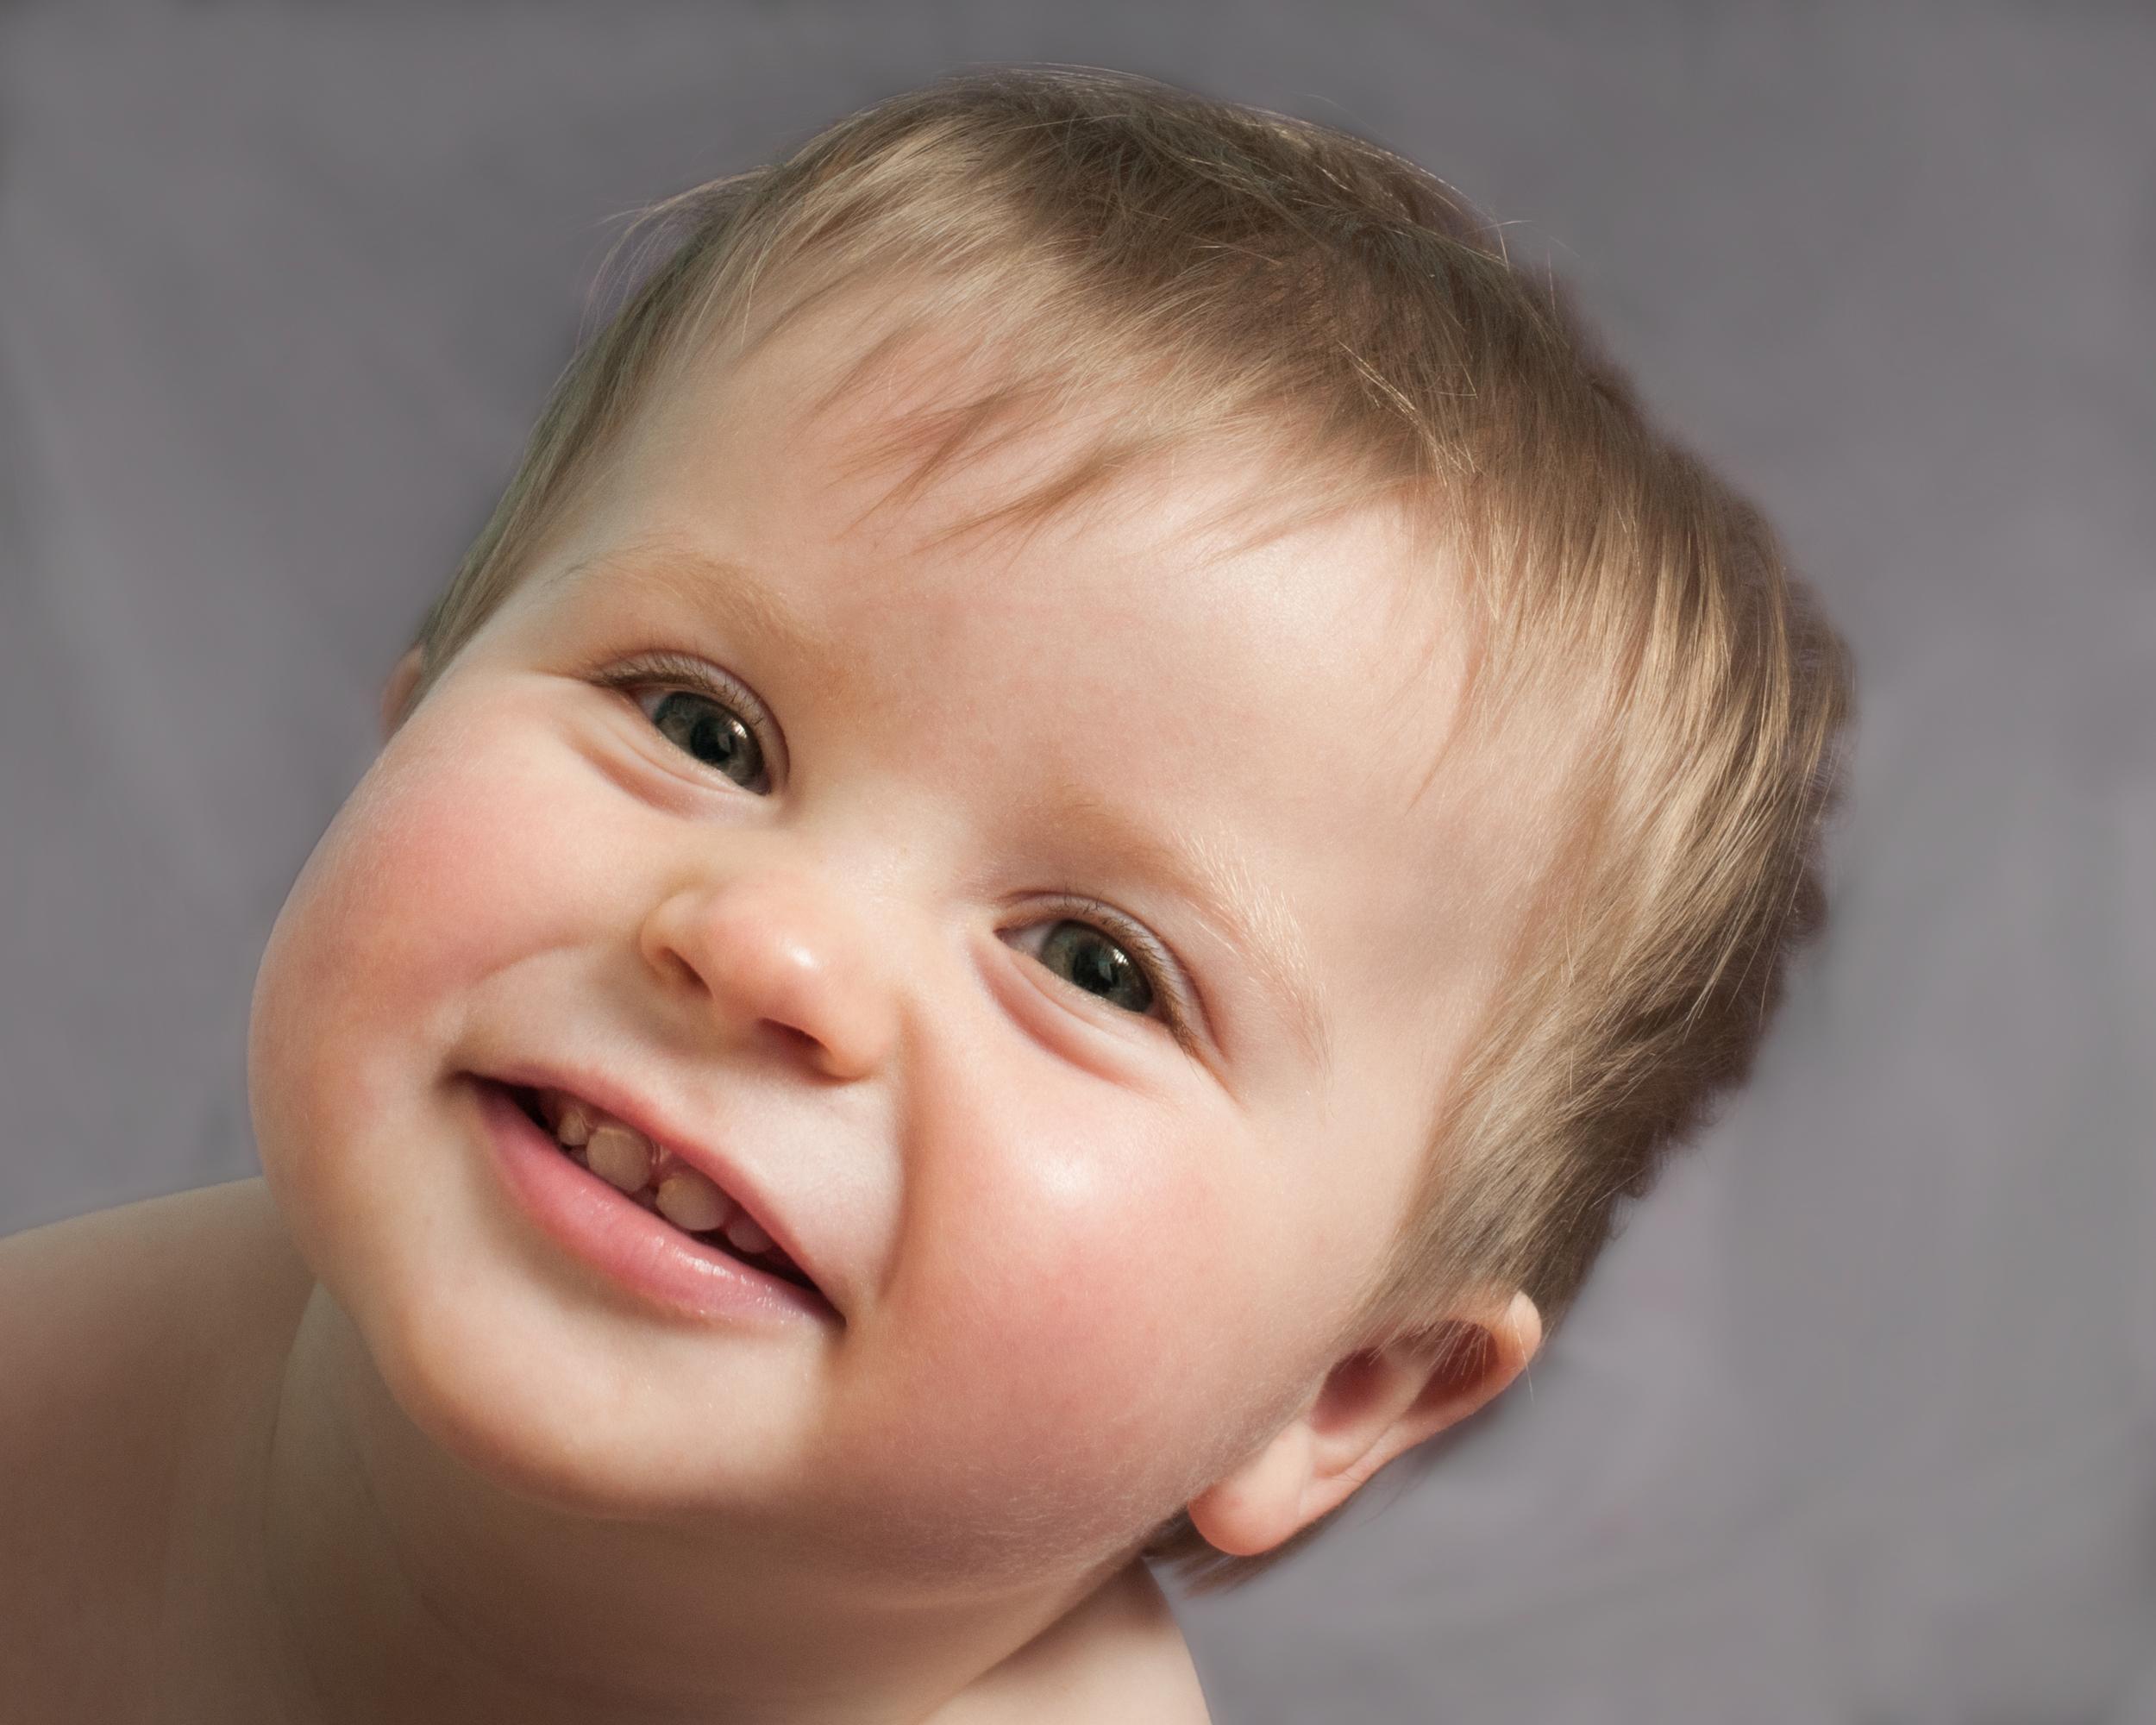 Ten Month Old Baby Portrait